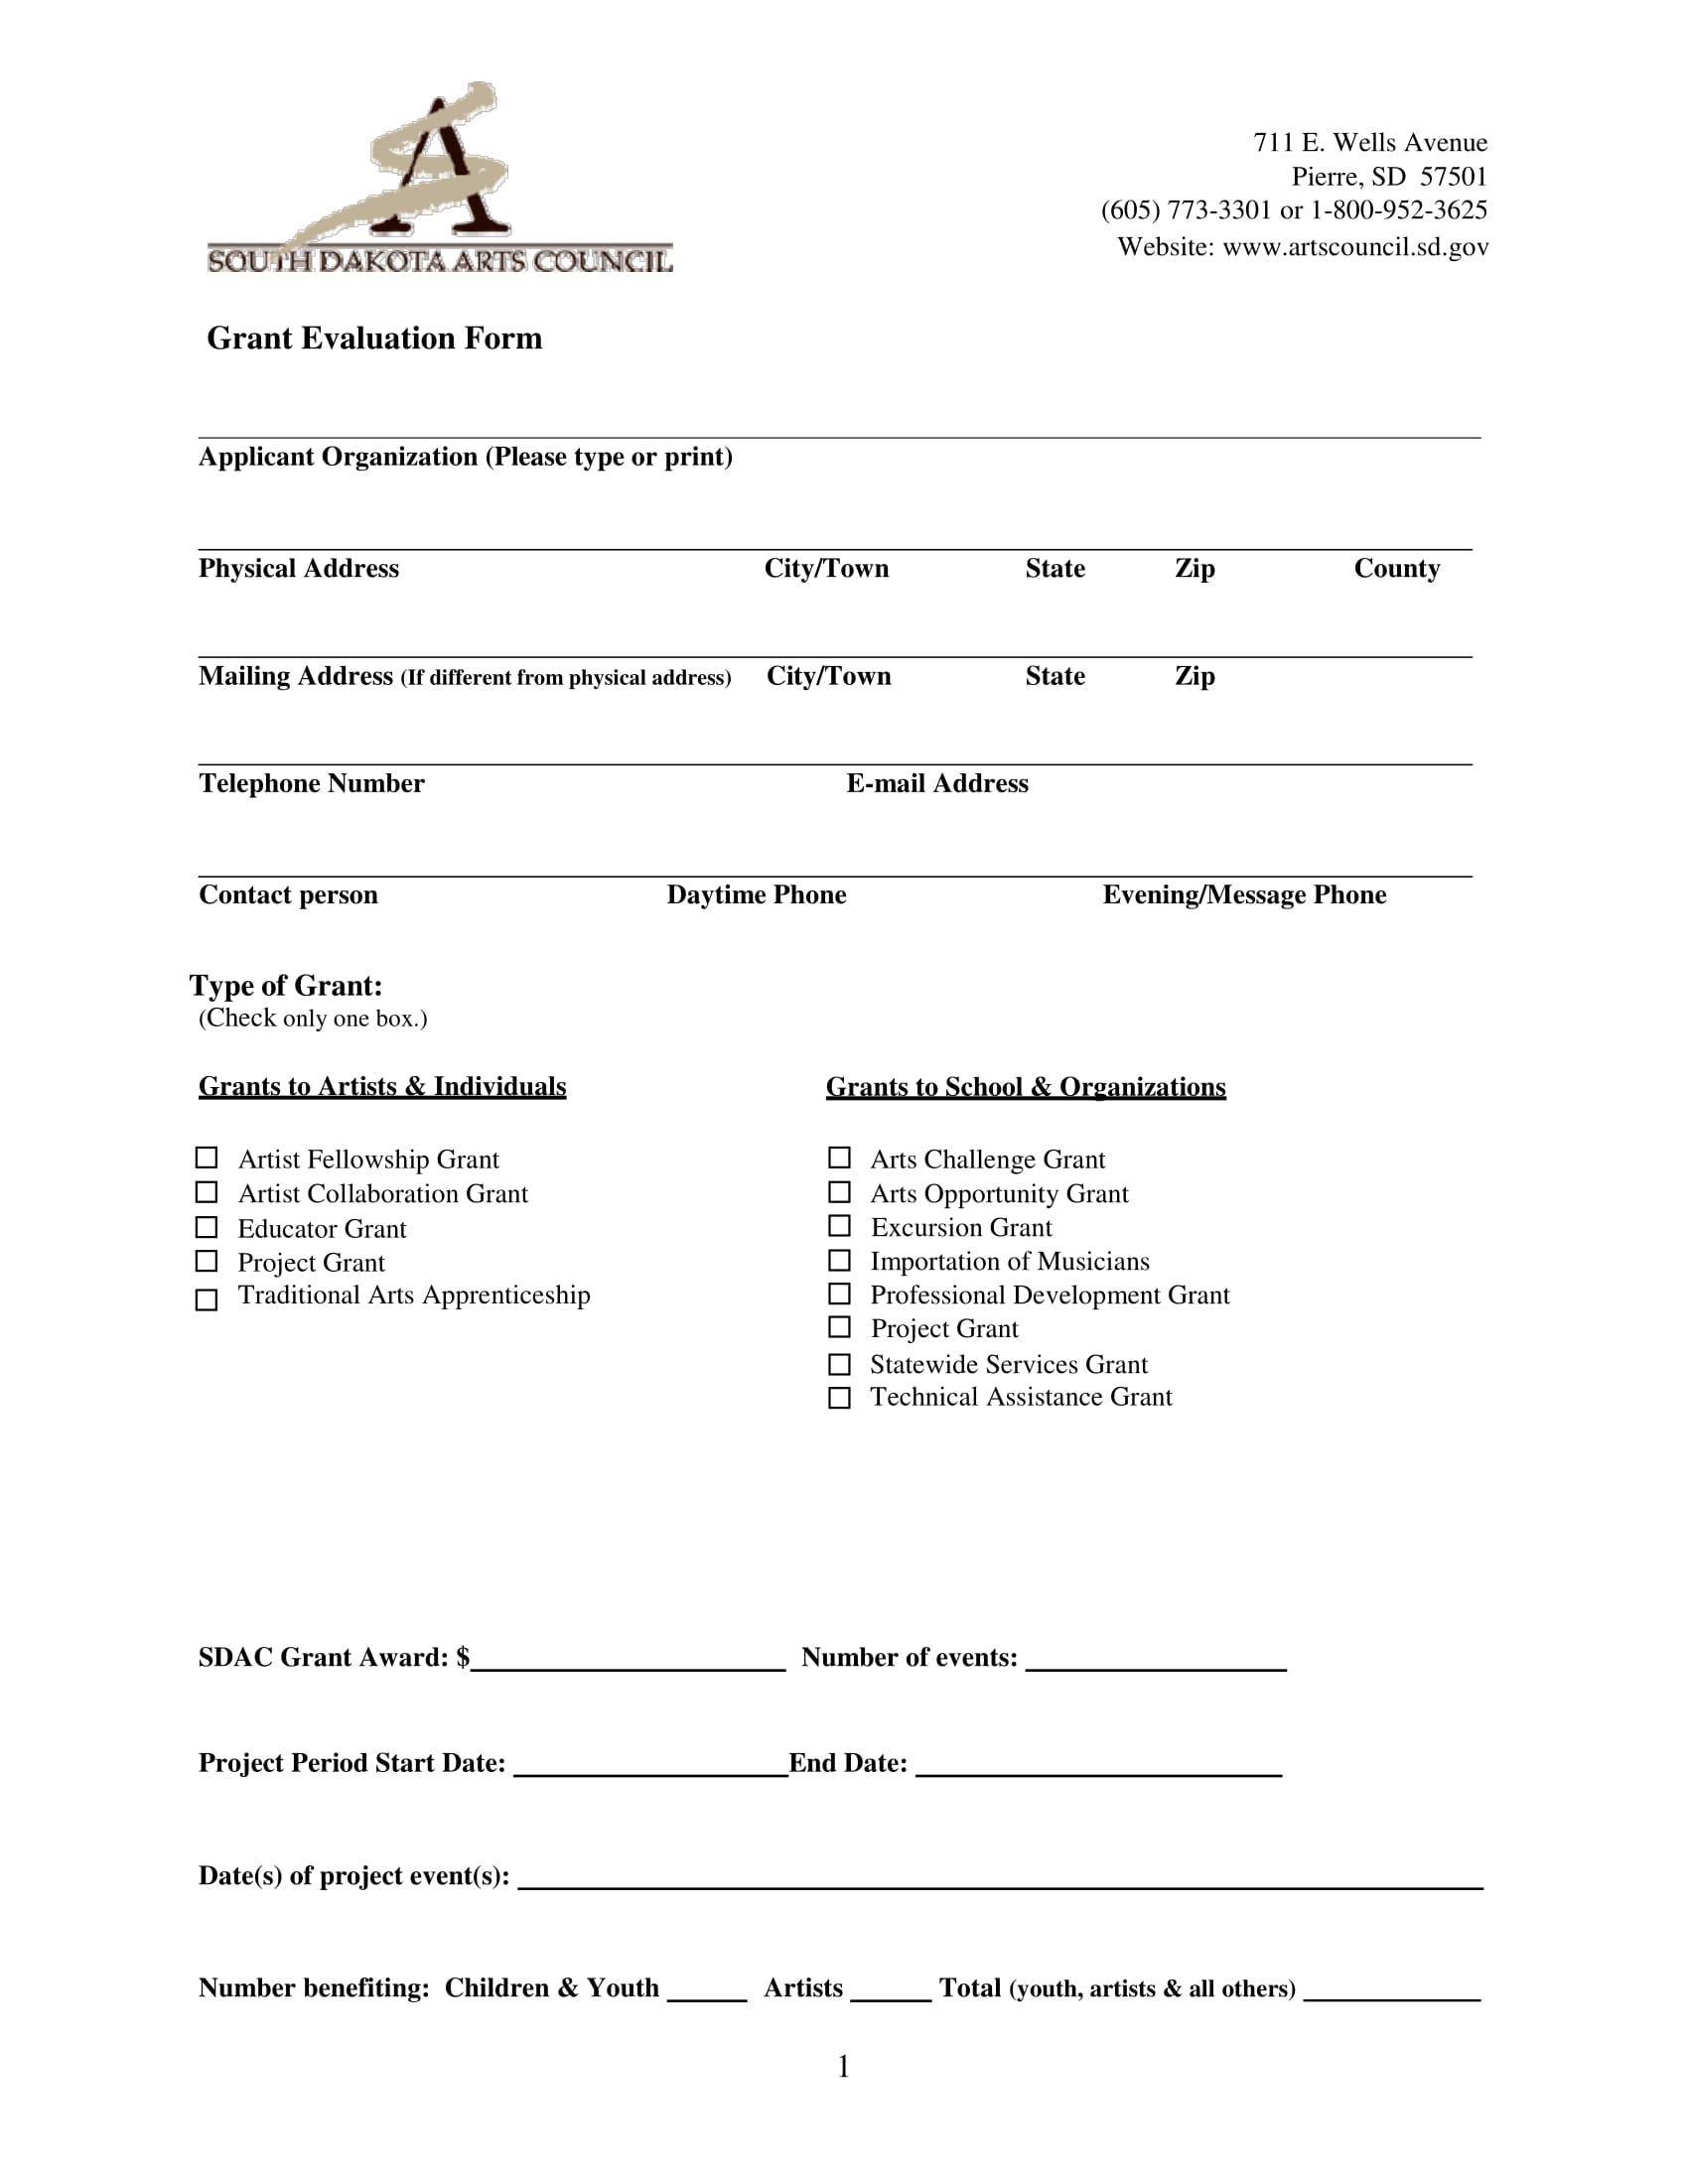 arts council grant evaluation form 1